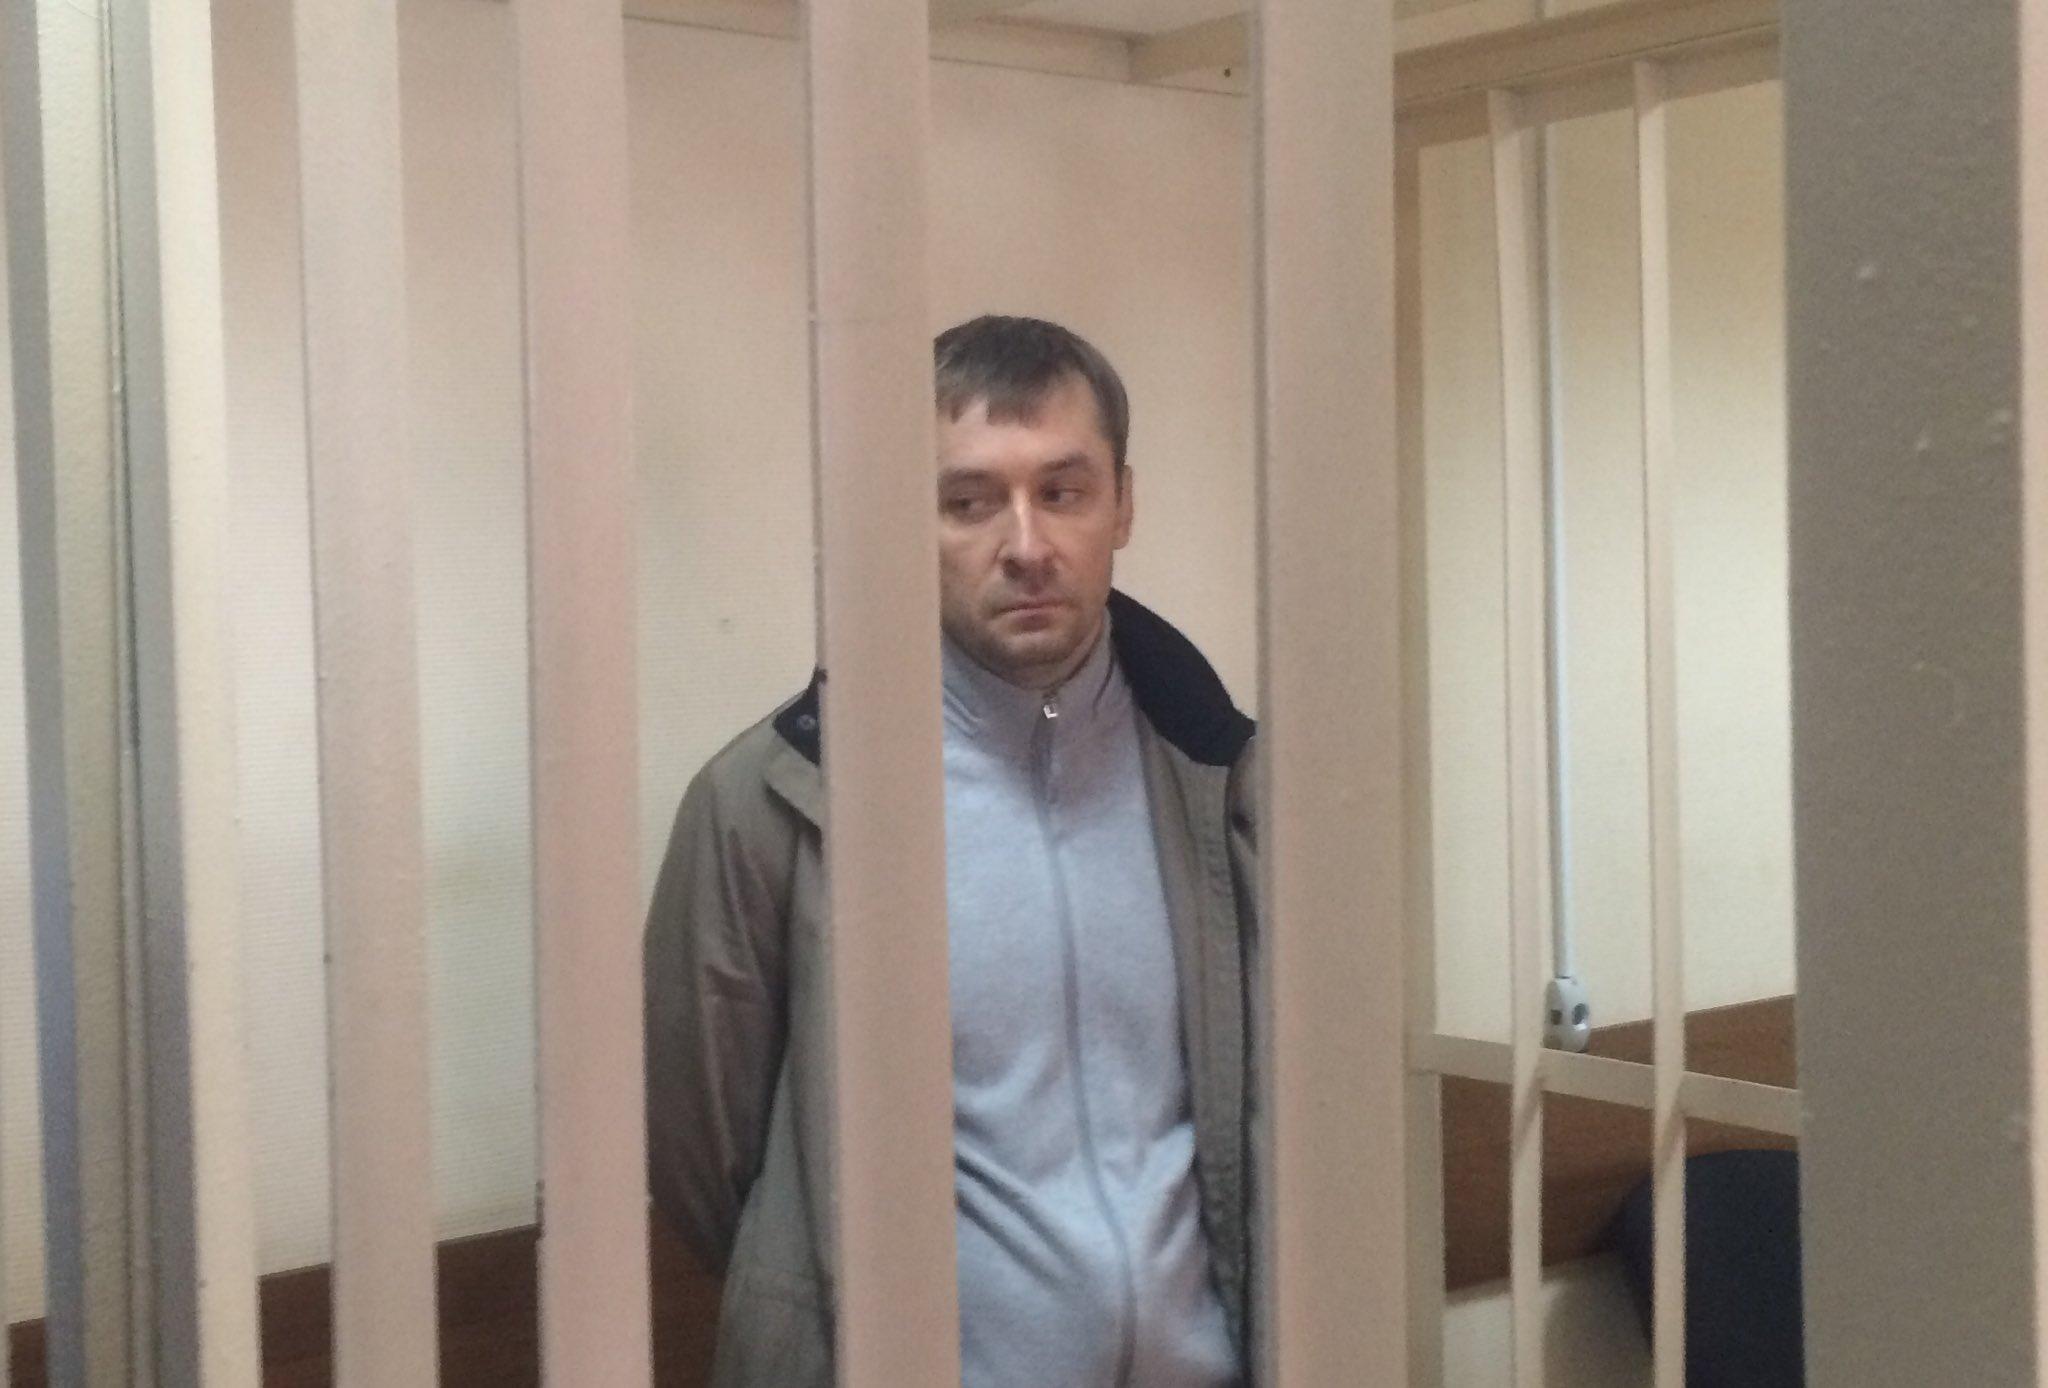 костей захарченко арестован фото денег них, как